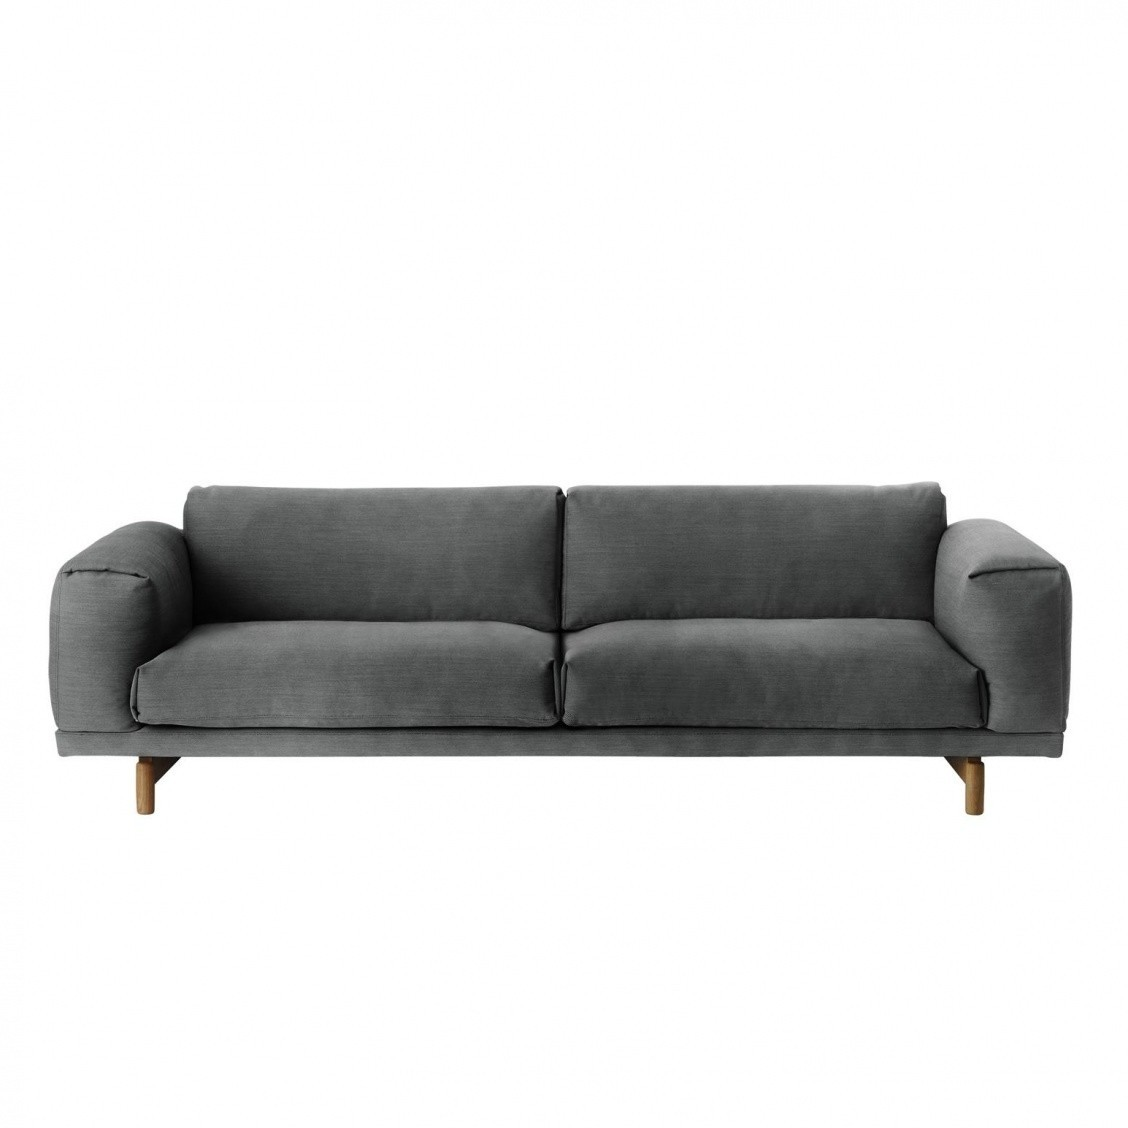 Muuto Rest Sofa 3 Seater Dark